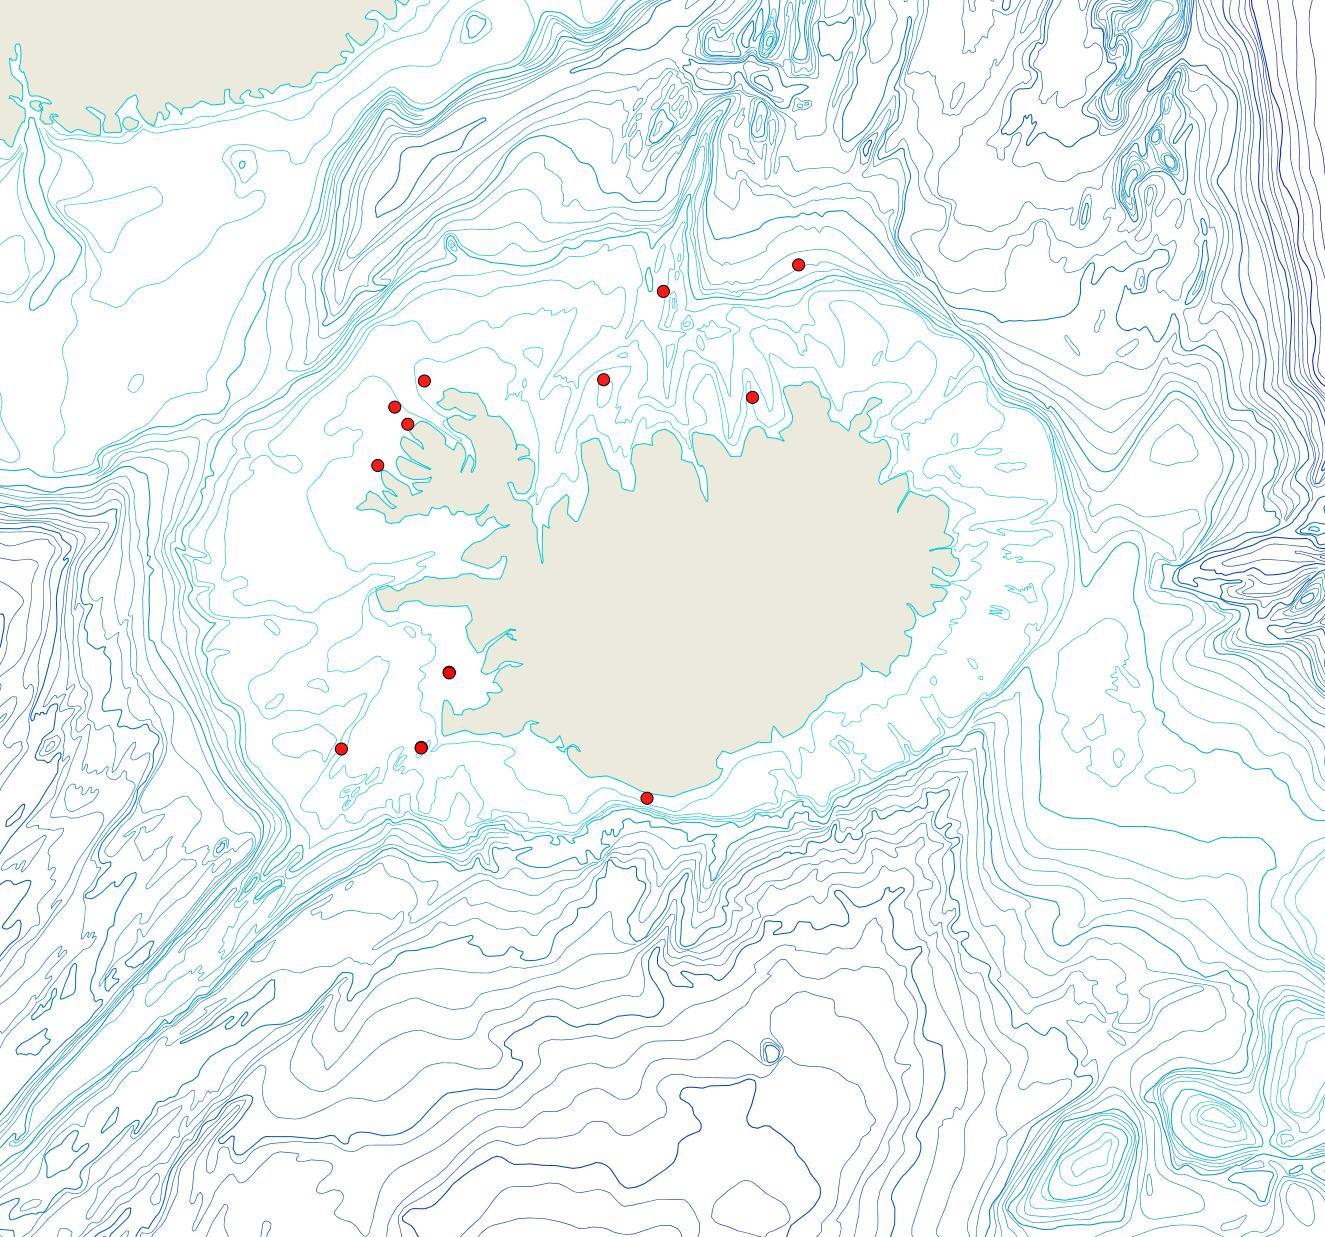 Útbreiðsla Dendrobeania murrayana(Bioice samples, red dots)